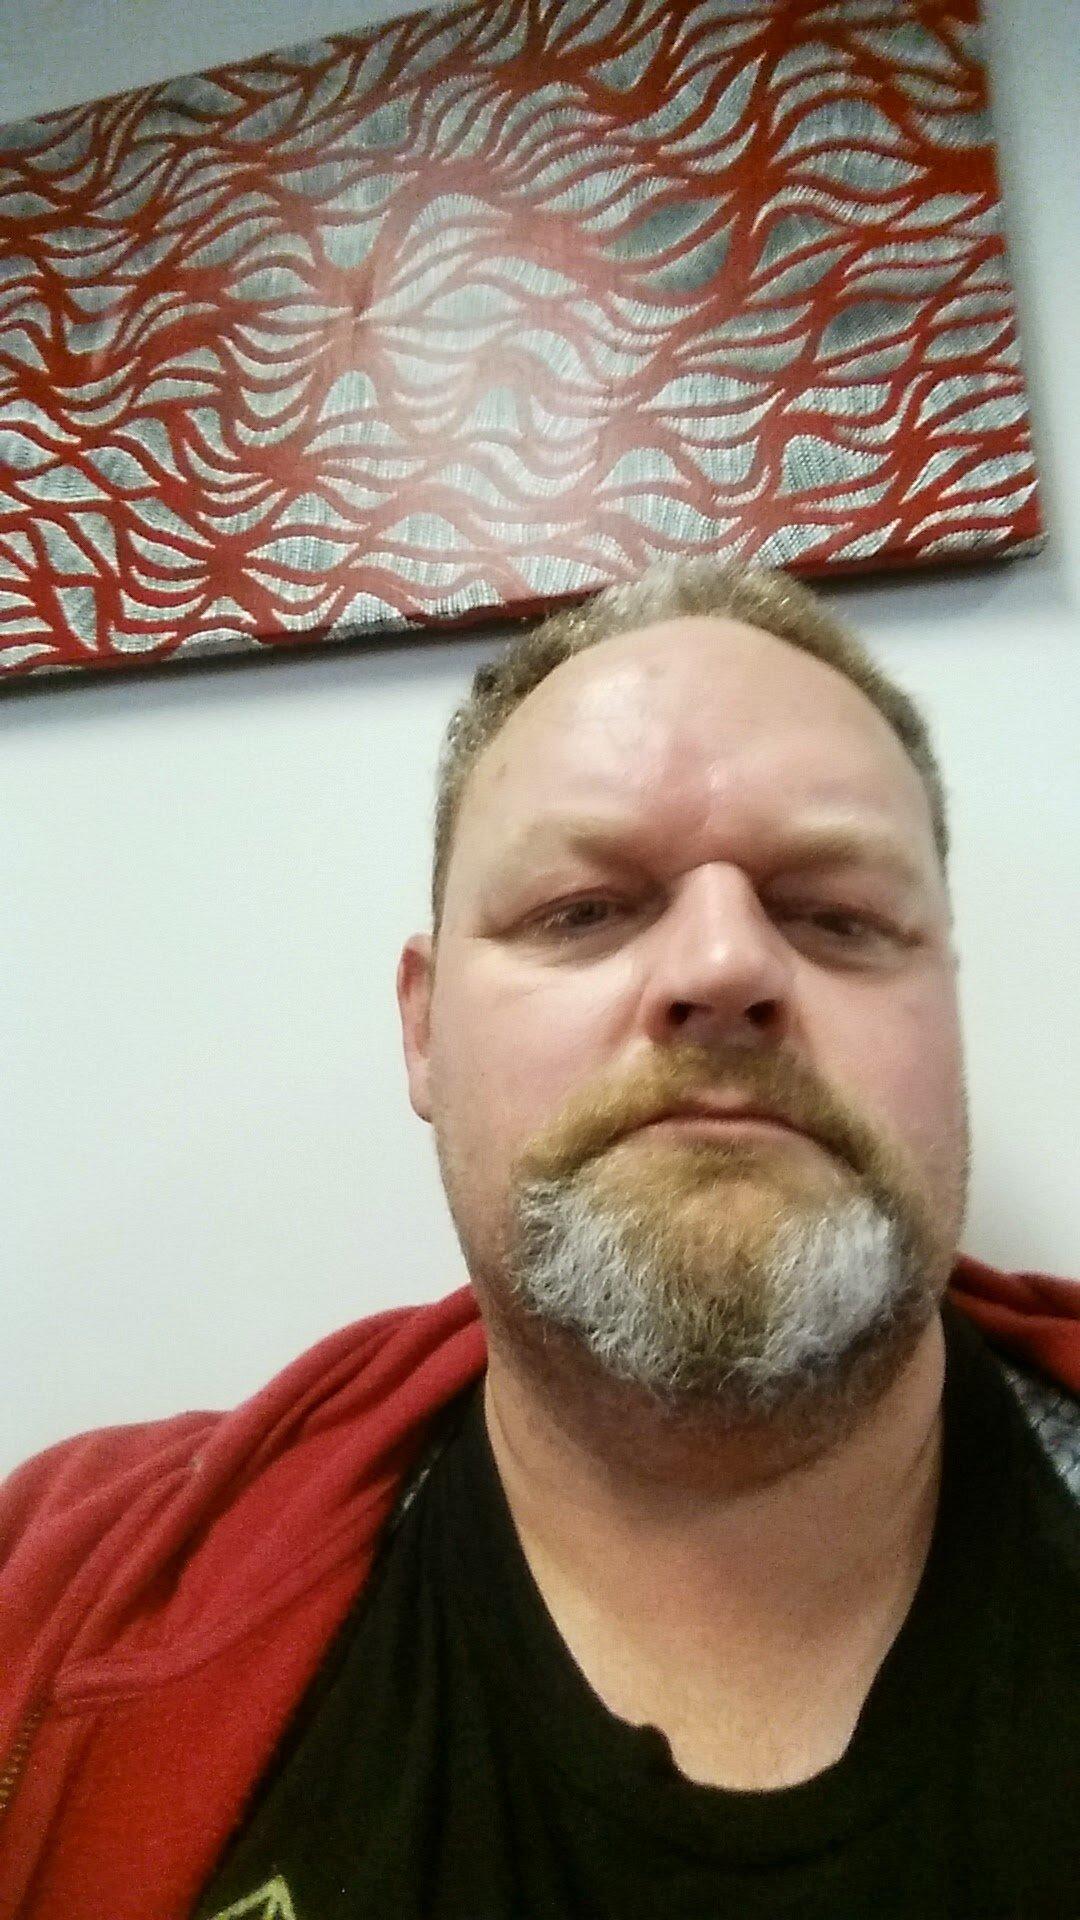 Pete69lover2615gml from Australian Capital Territory,Australia